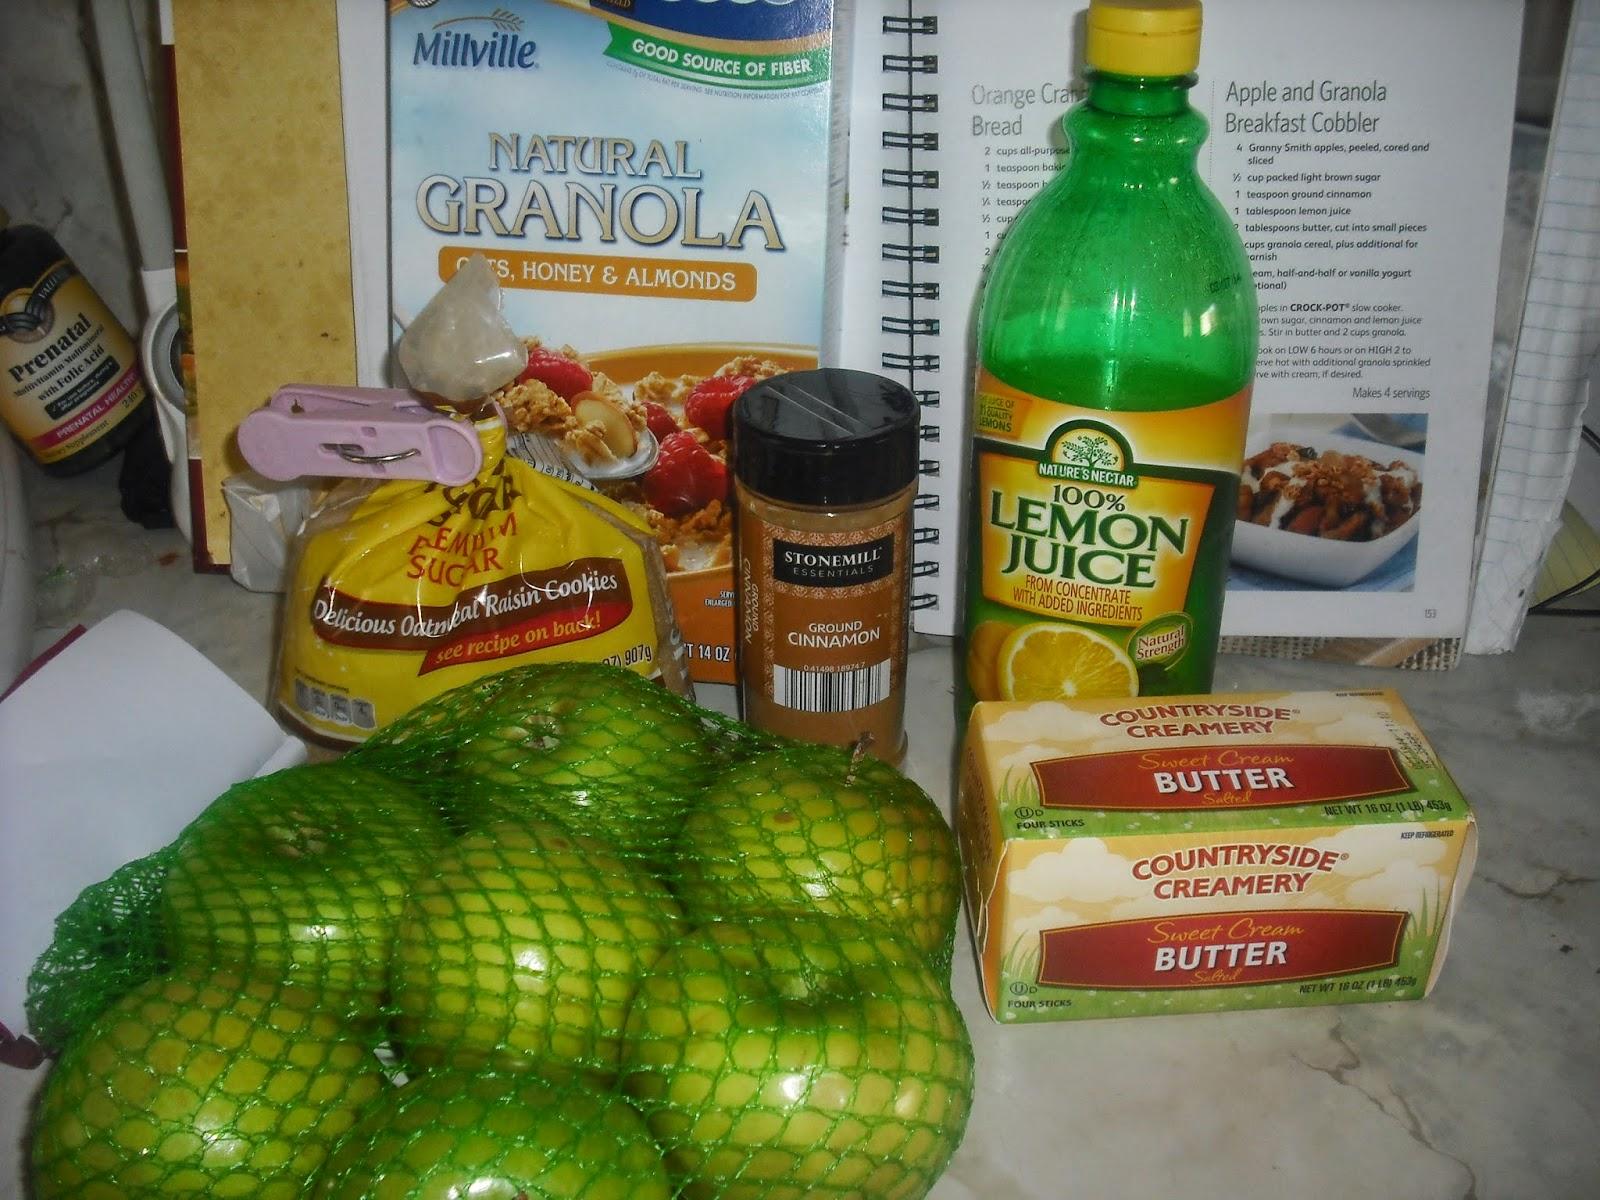 365 No Repeats: June 18: Apple and Granola Breakfast Cobbler